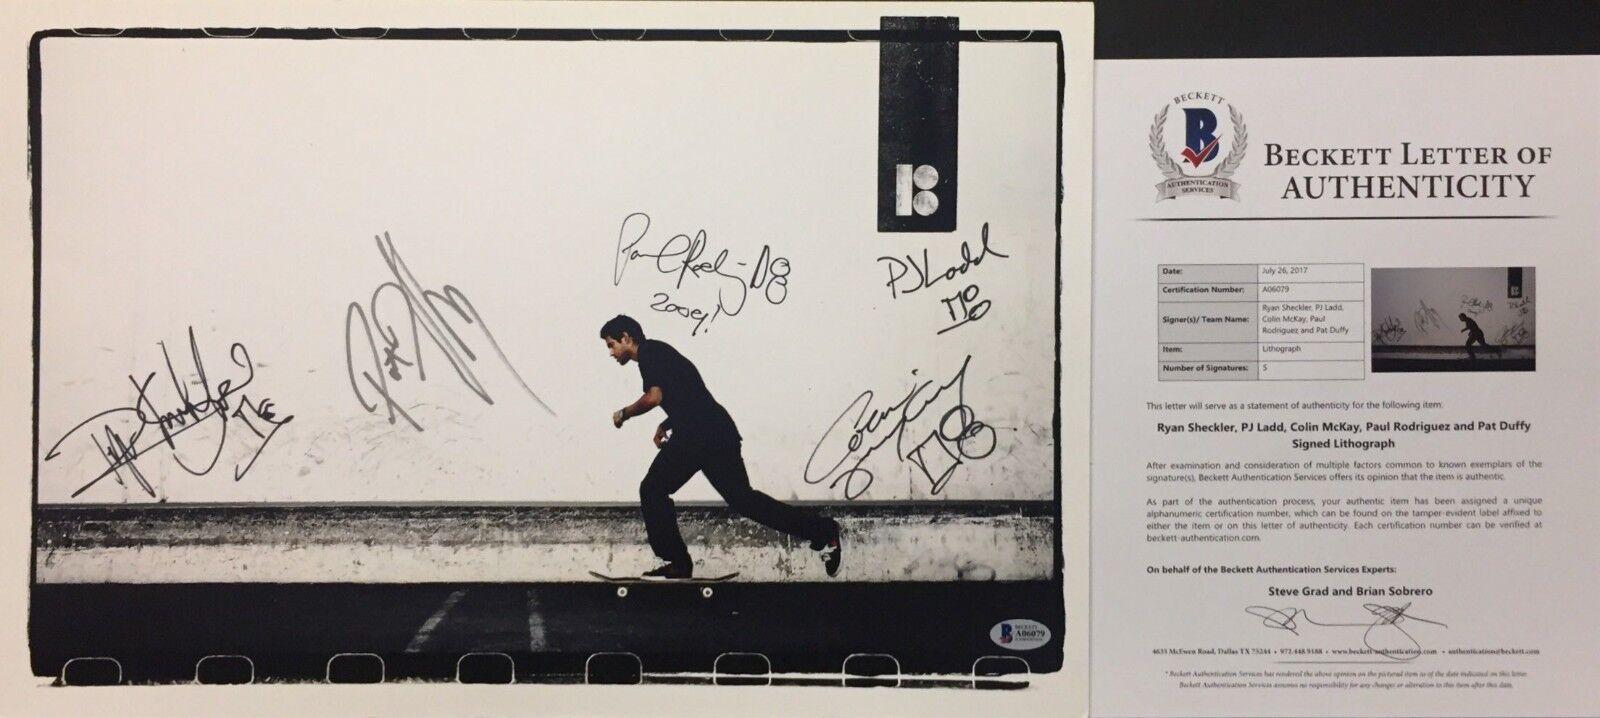 Ryan Sheckler PJ Ladd Colin McKay Paul Rodriguez P. Duffy Signed 12x18 Photo BAS